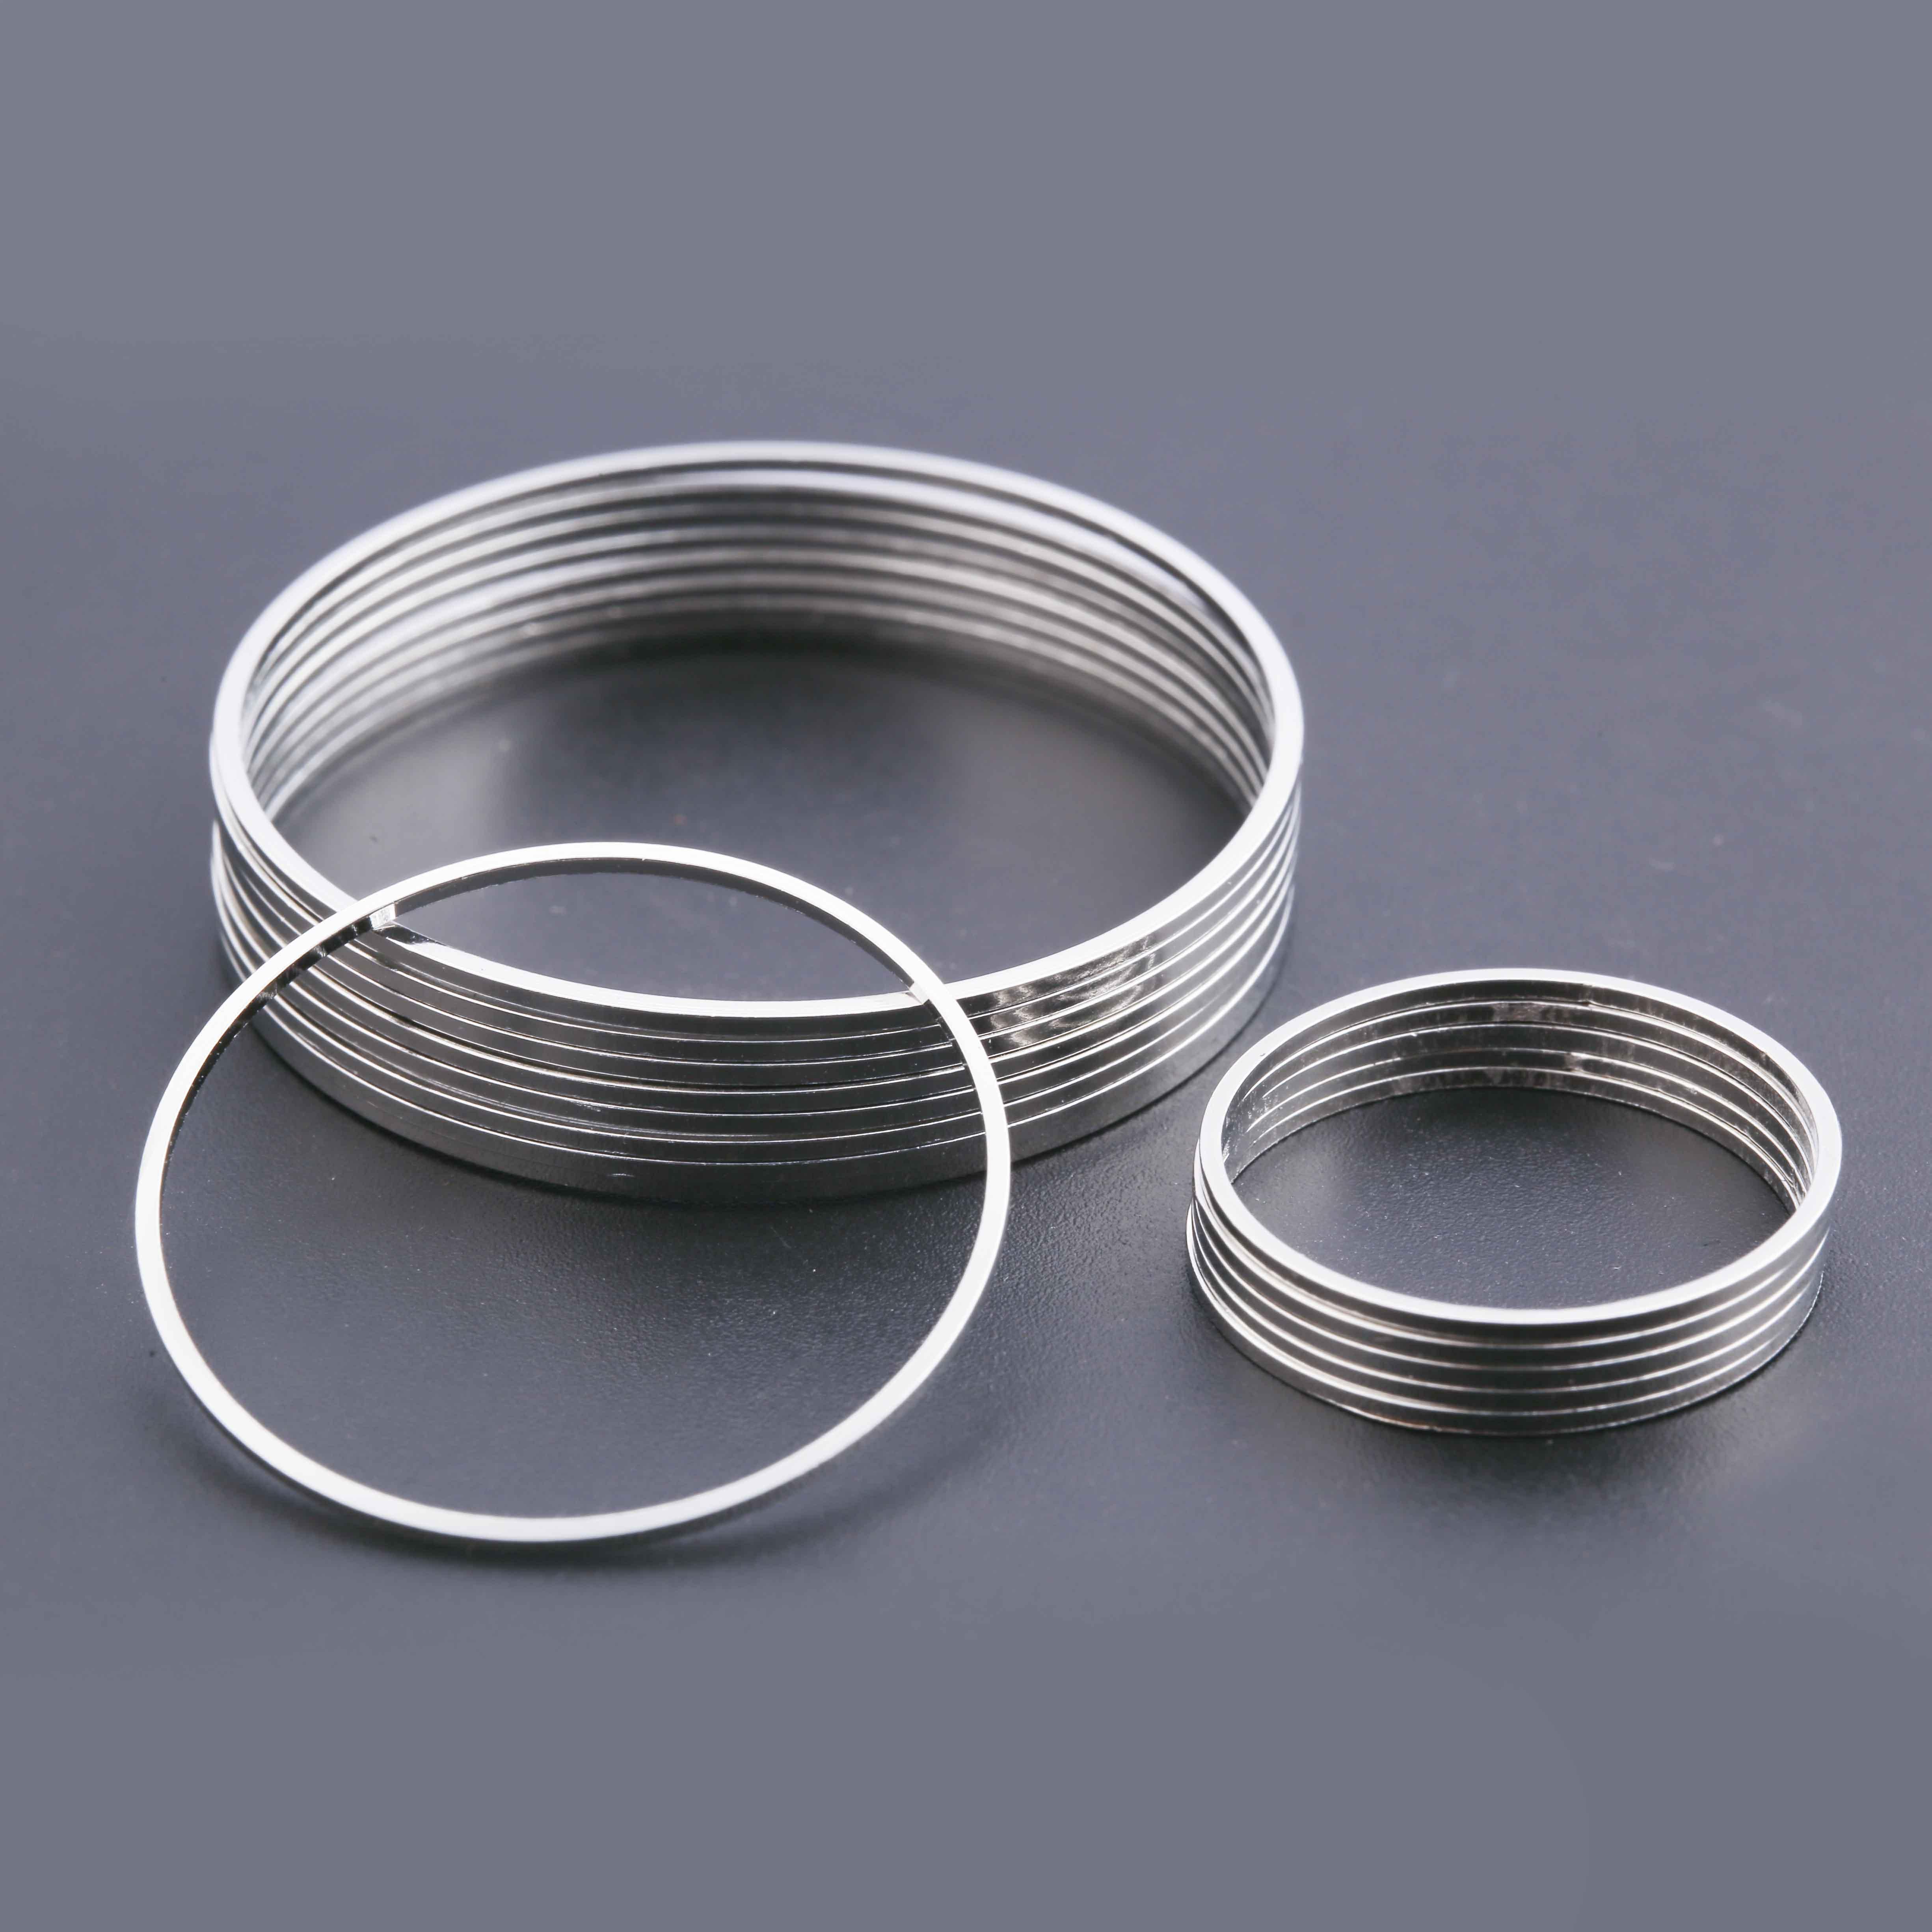 30PCS Stainless Steel Wine Glass Charm Rings Earrings Hoops Jewelry Making 35mm